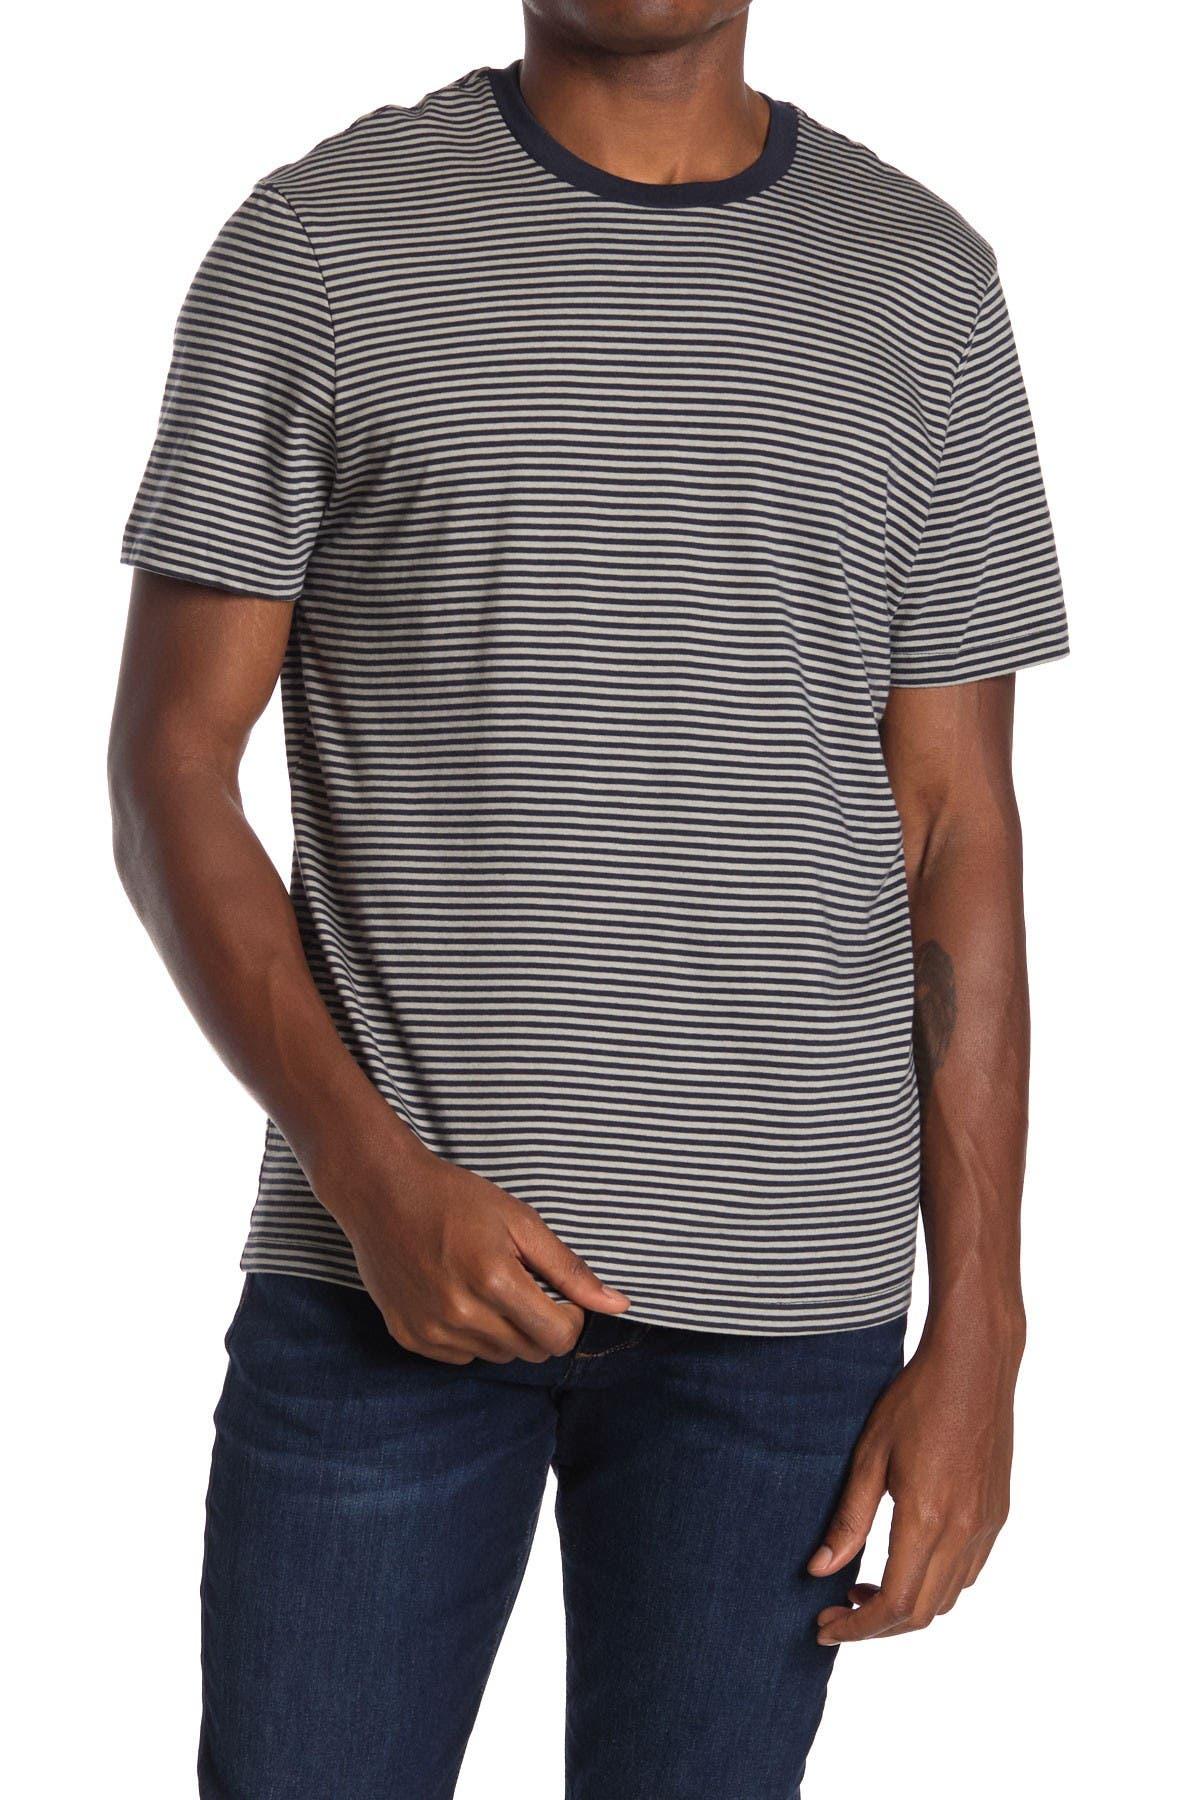 Image of Joe Fresh Striped Crew Neck T-Shirt